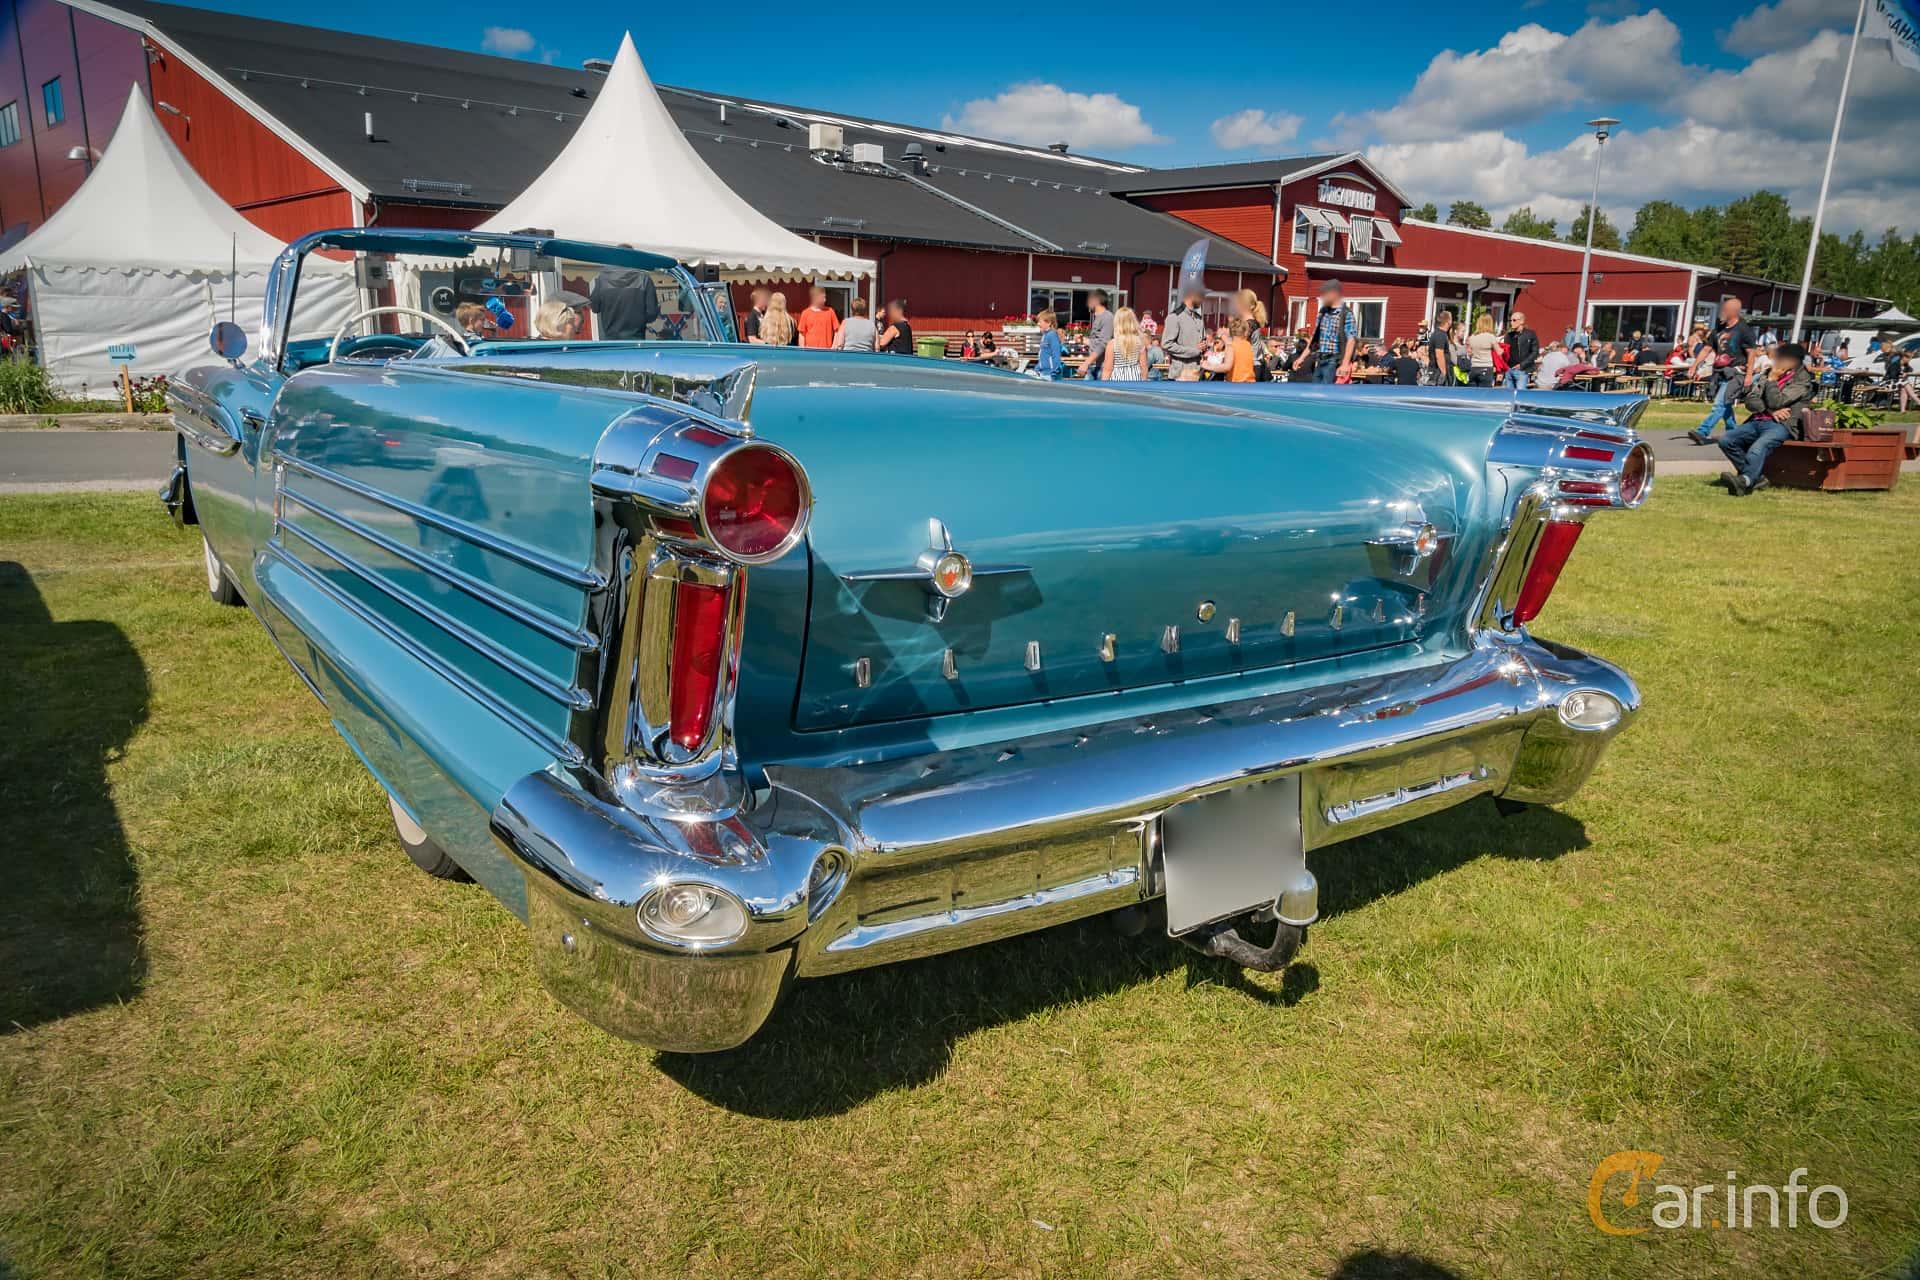 Oldsmobile Ninety-Eight Convertible Coupé 6.1 V8 Hydra-Matic, 309hp, 1958 at Nostalgifestivalen i Vårgårda 2016